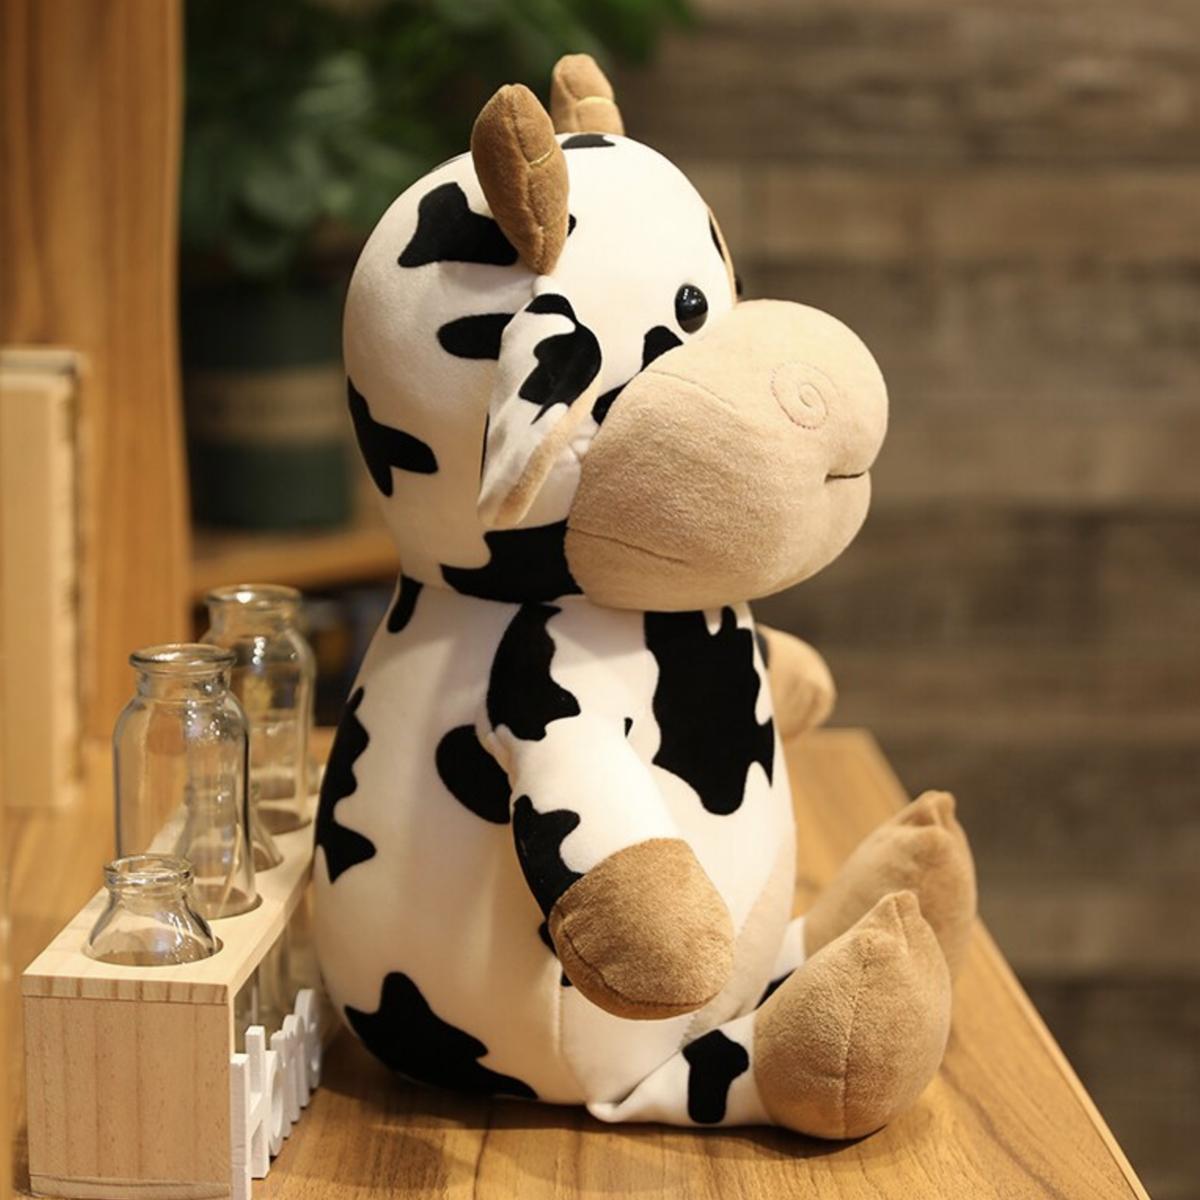 Stuffed Cow Plush Toy